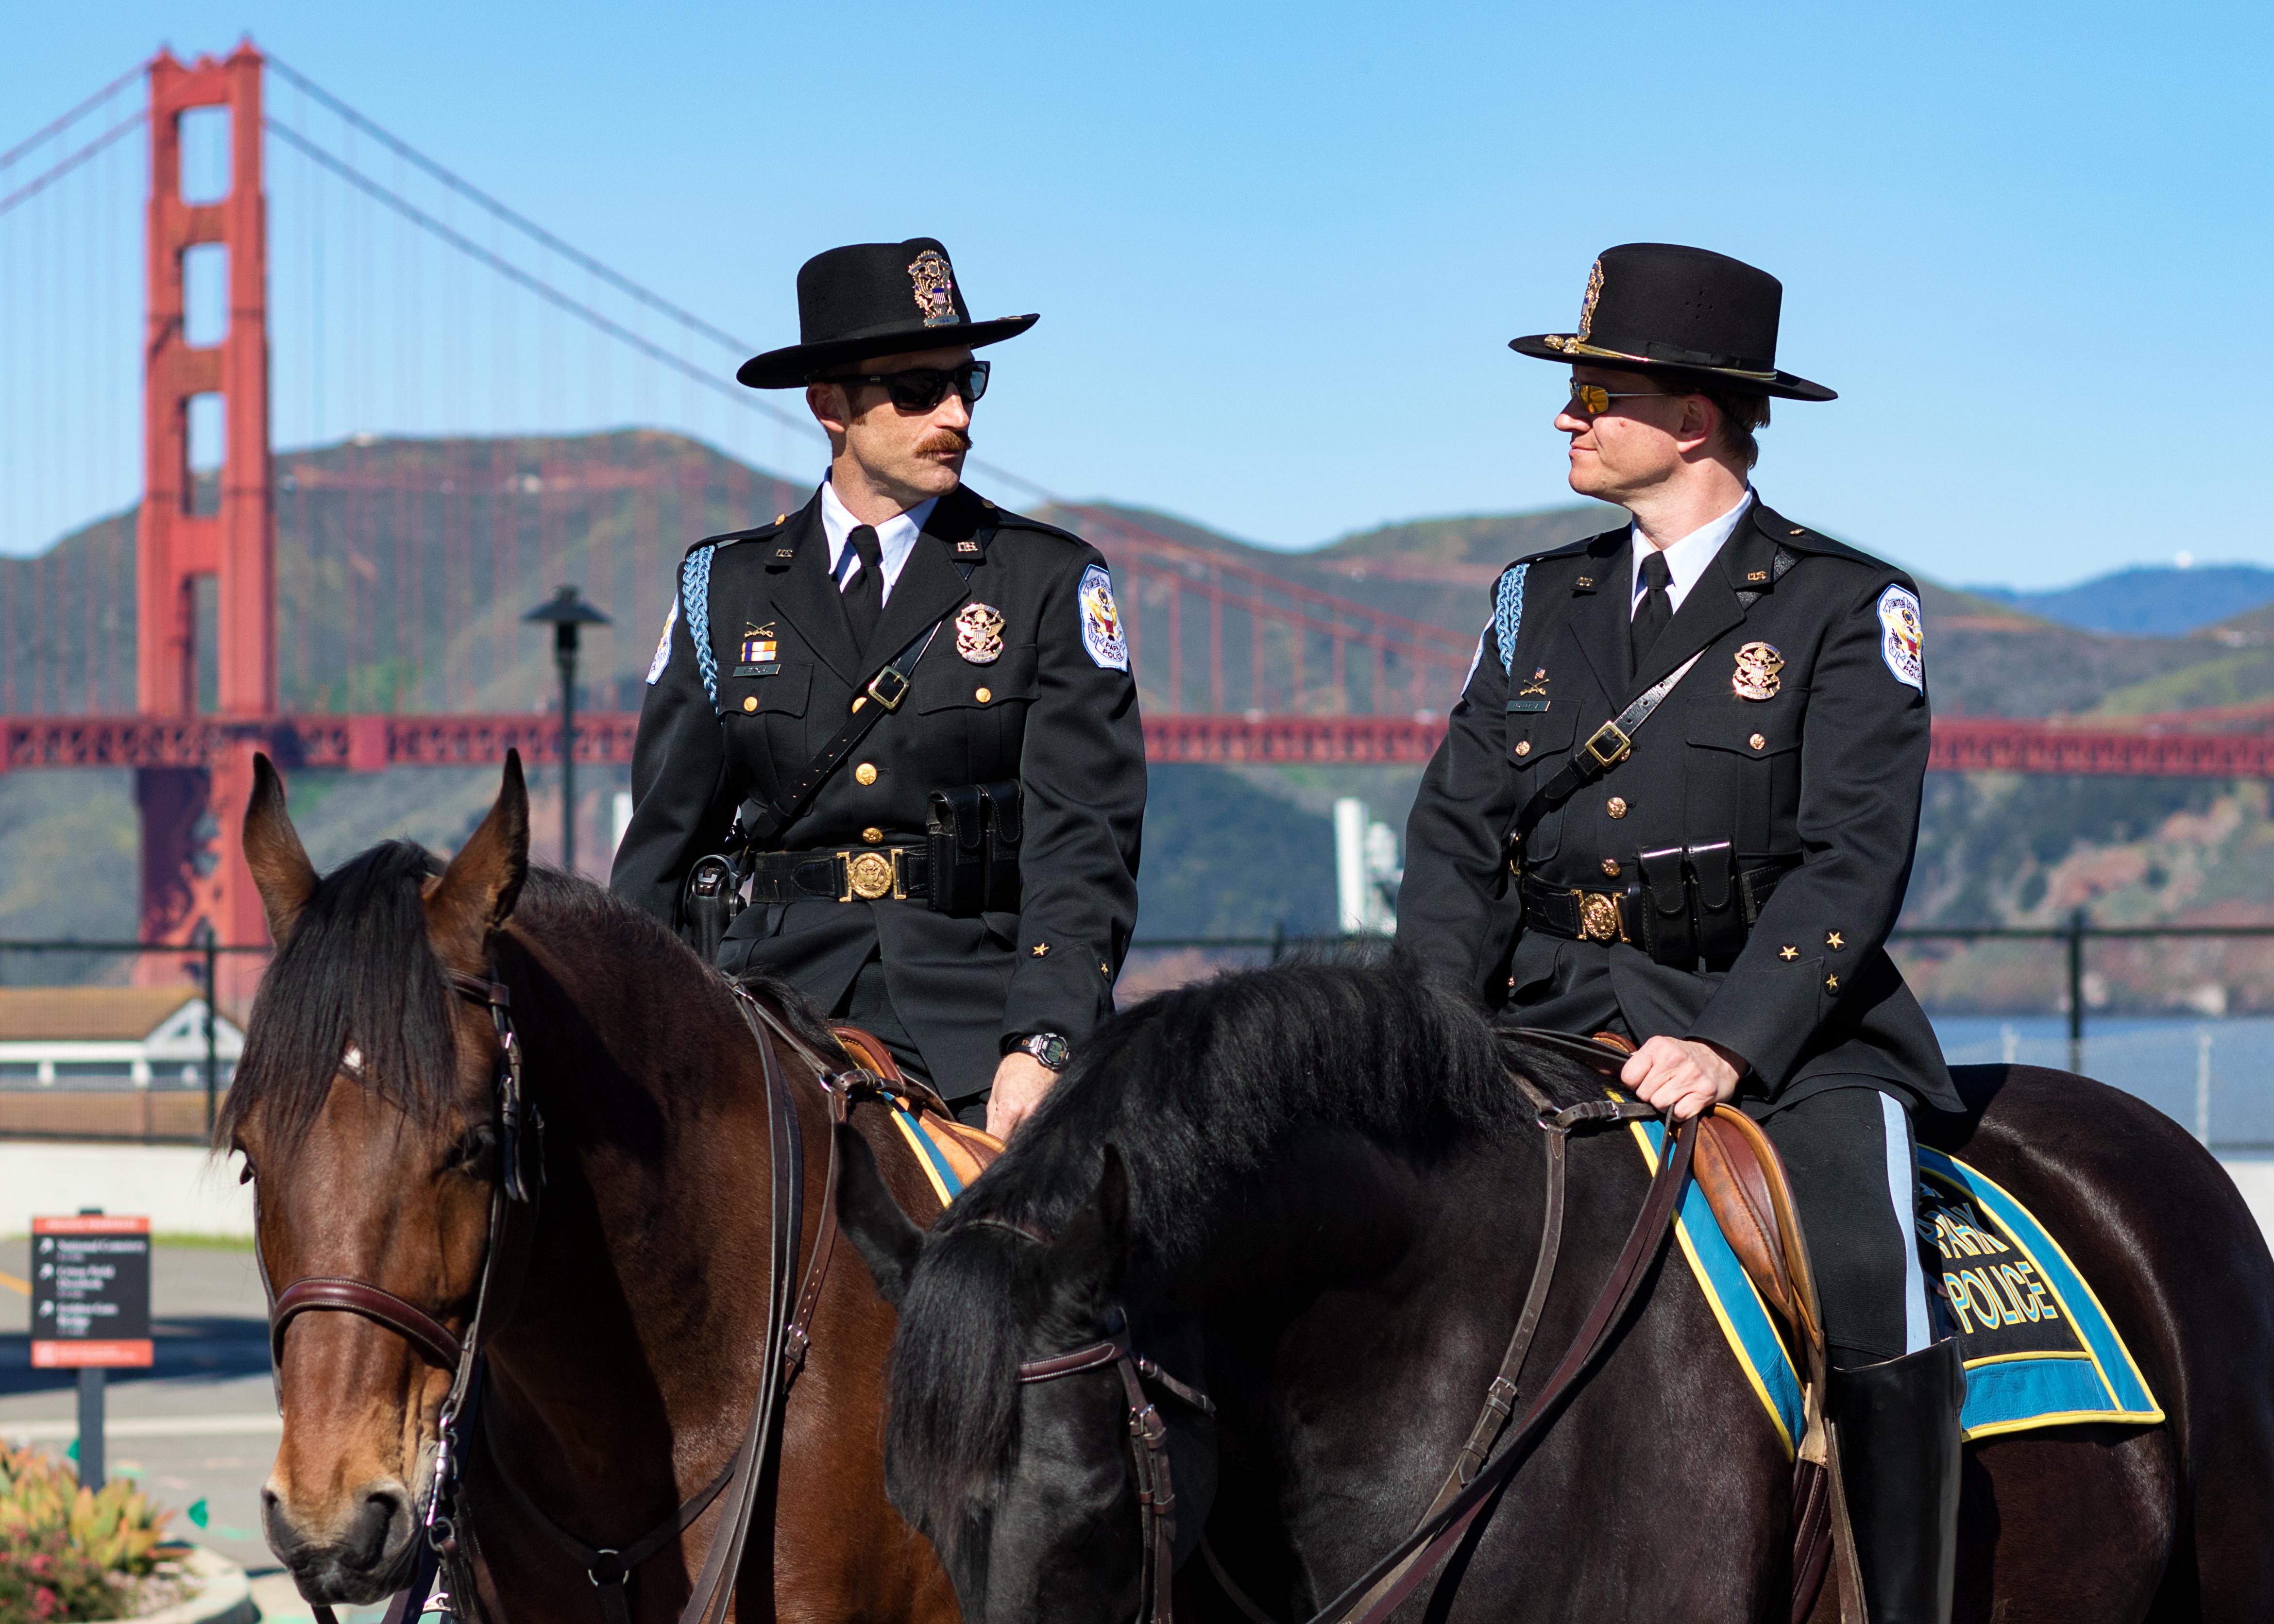 Mounted Police Wikipedia